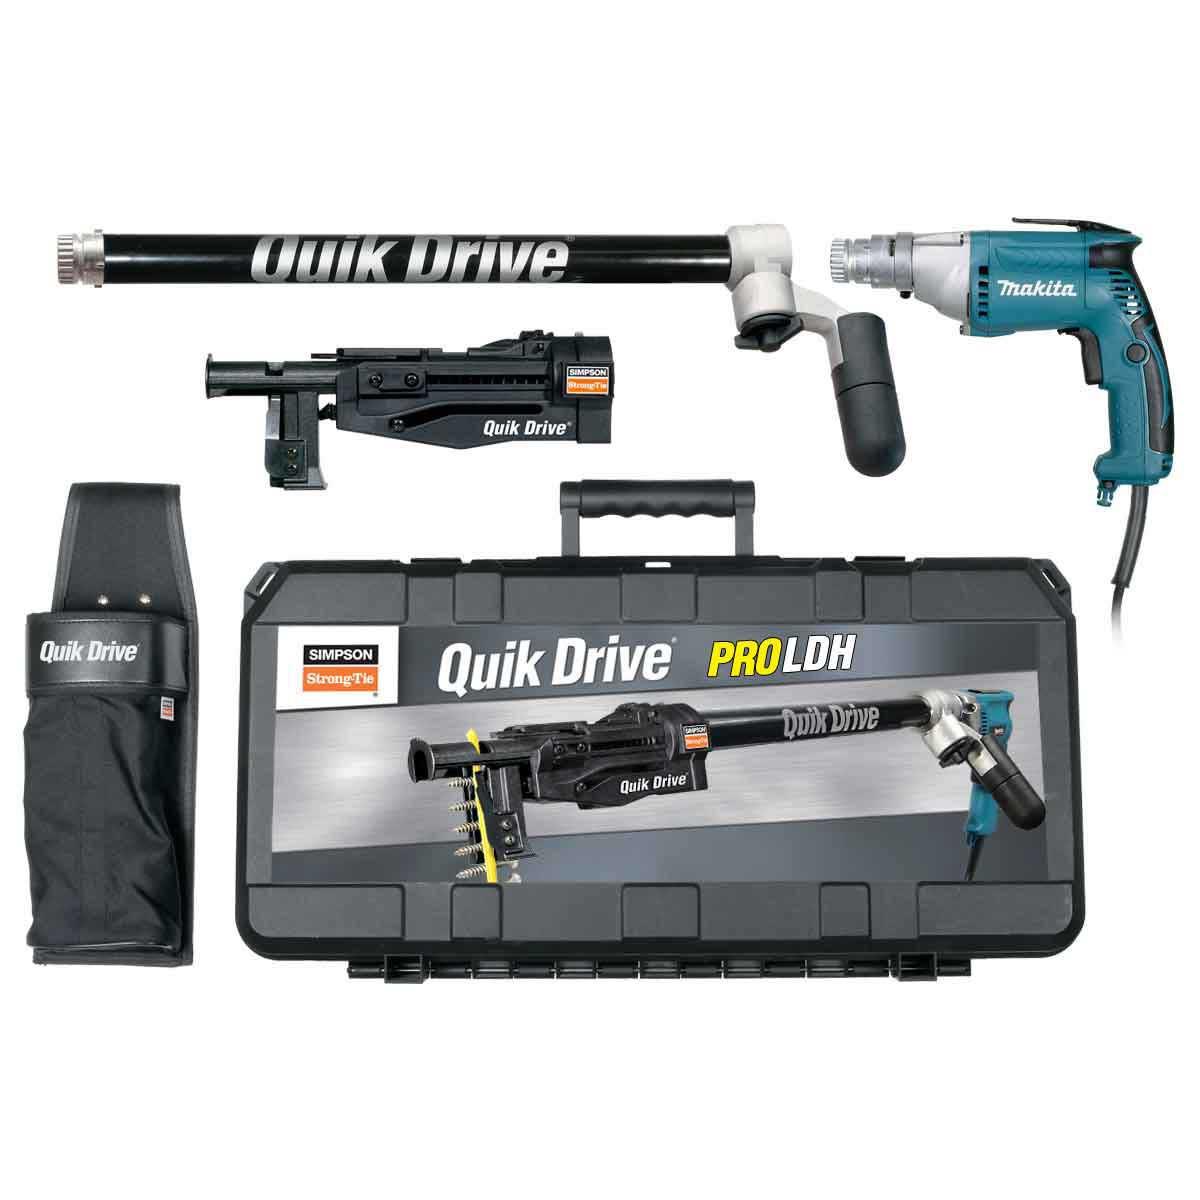 Quik Drive Sub Floor Fastening Kit